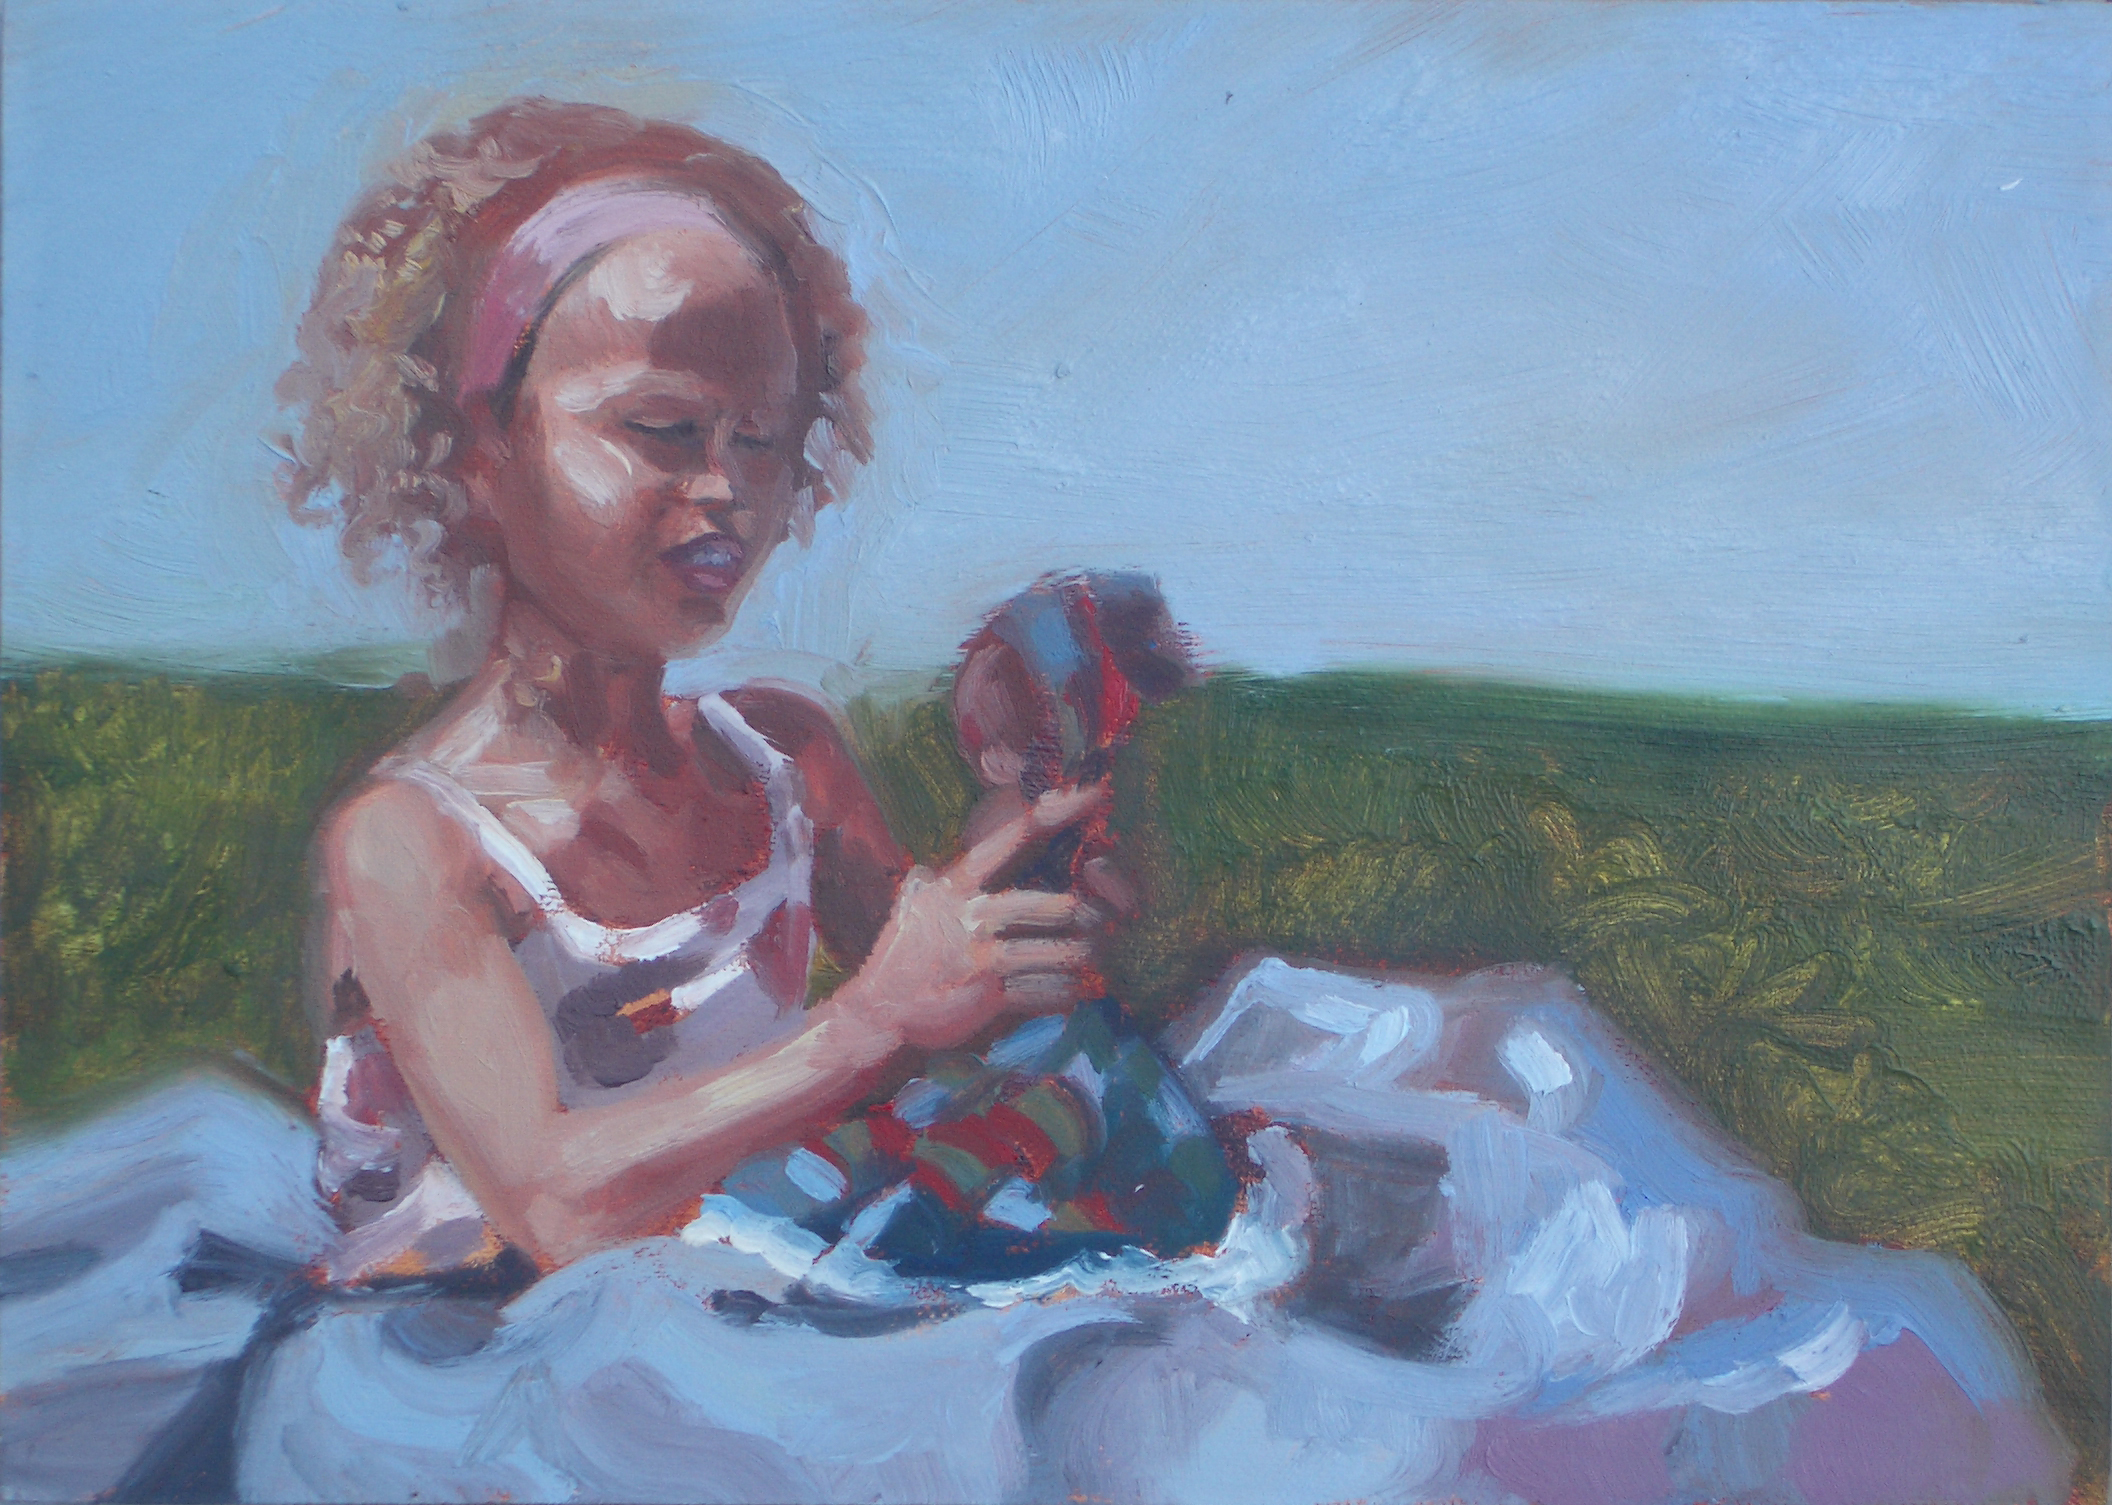 Scarlett with Doll Outside